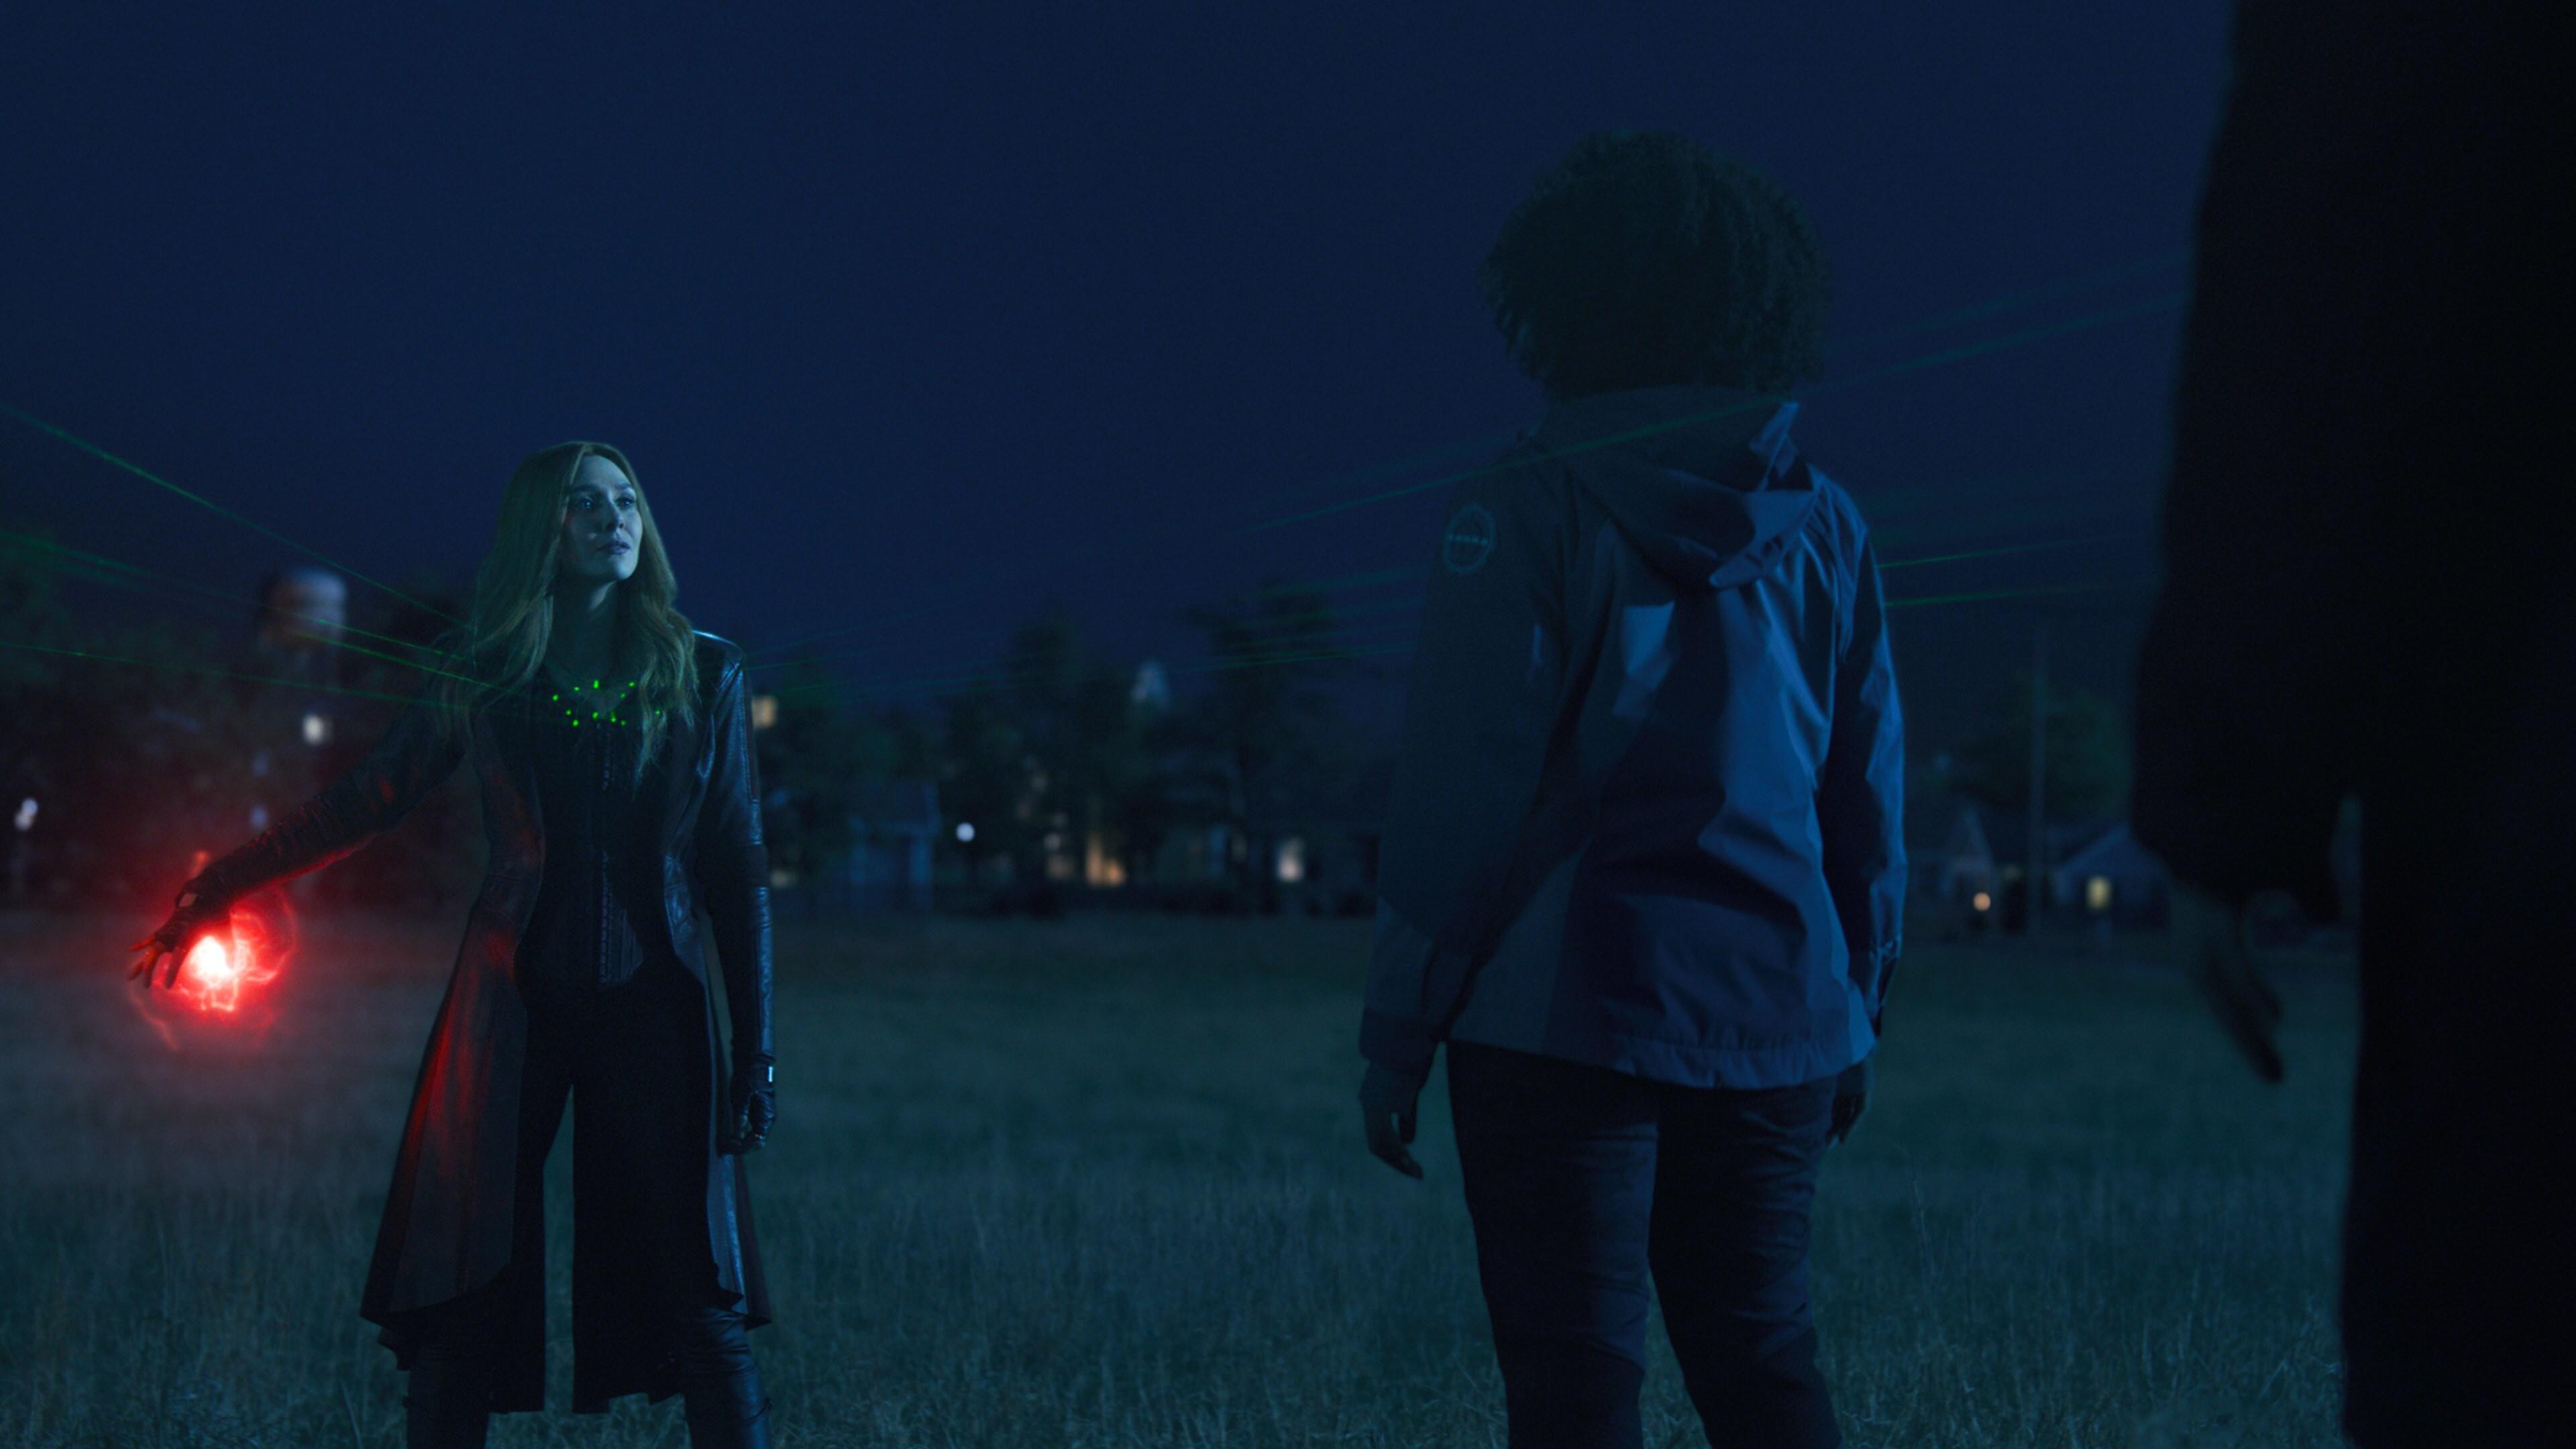 (L-R): Elizabeth Olsen as Wanda Maximoff and Teyonah Parris as Monica Rambeau in Marvel Studios' WANDAVISION exclusively on Disney+. Photo courtesy of Marvel Studios. ©Marvel Studios 2021. All Rights Reserved.